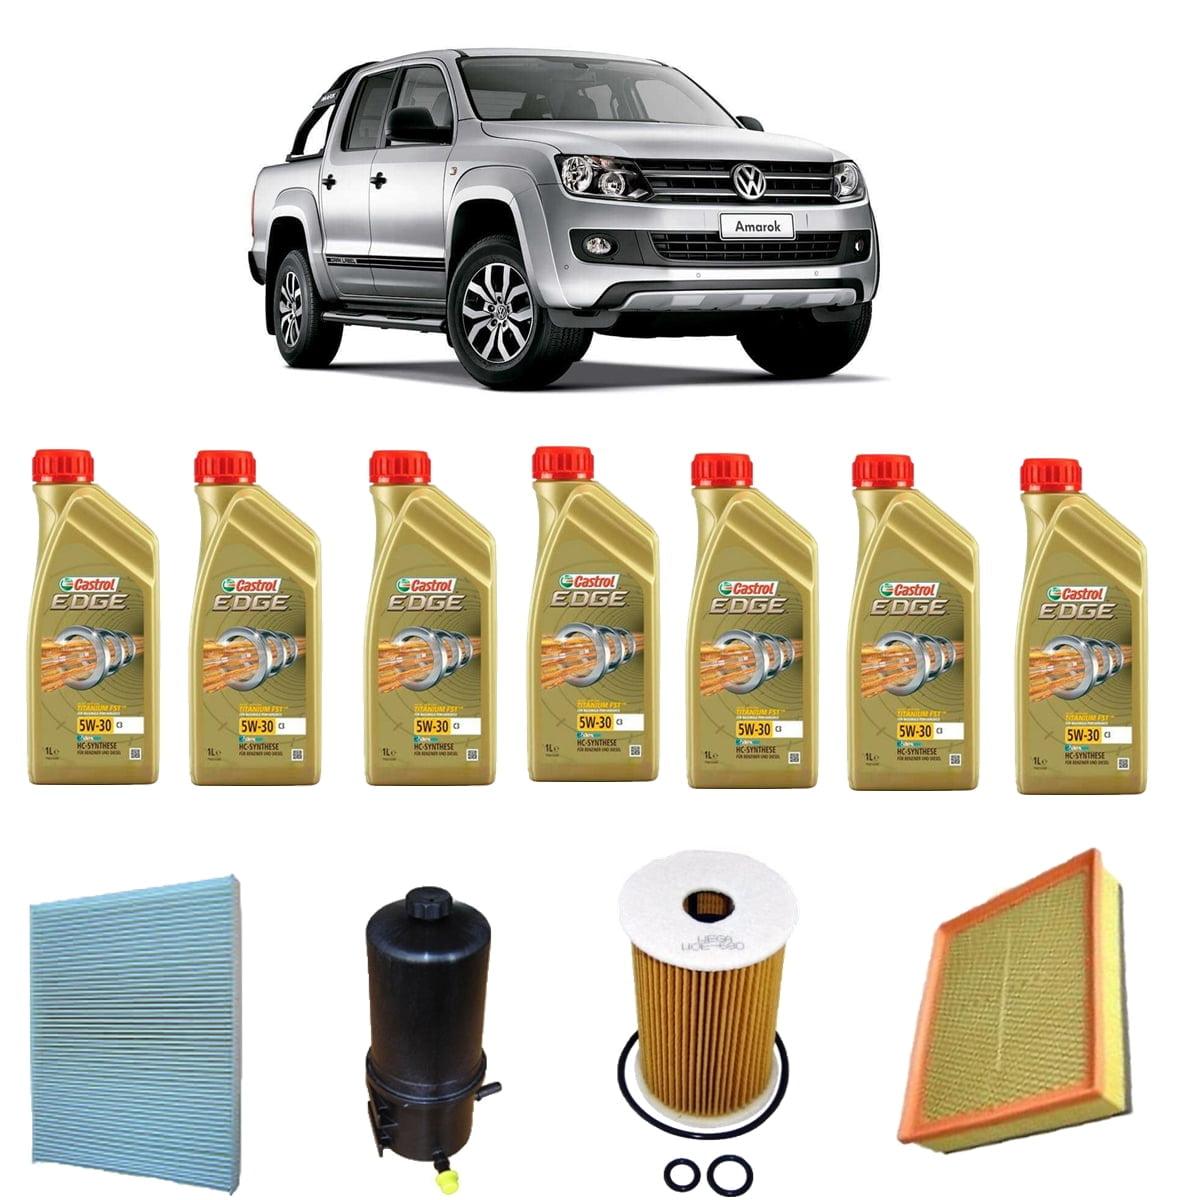 Troca De Oleo Castrol Edge 5w30 Volkswagen Amarok Diesel em até 6x sem juros